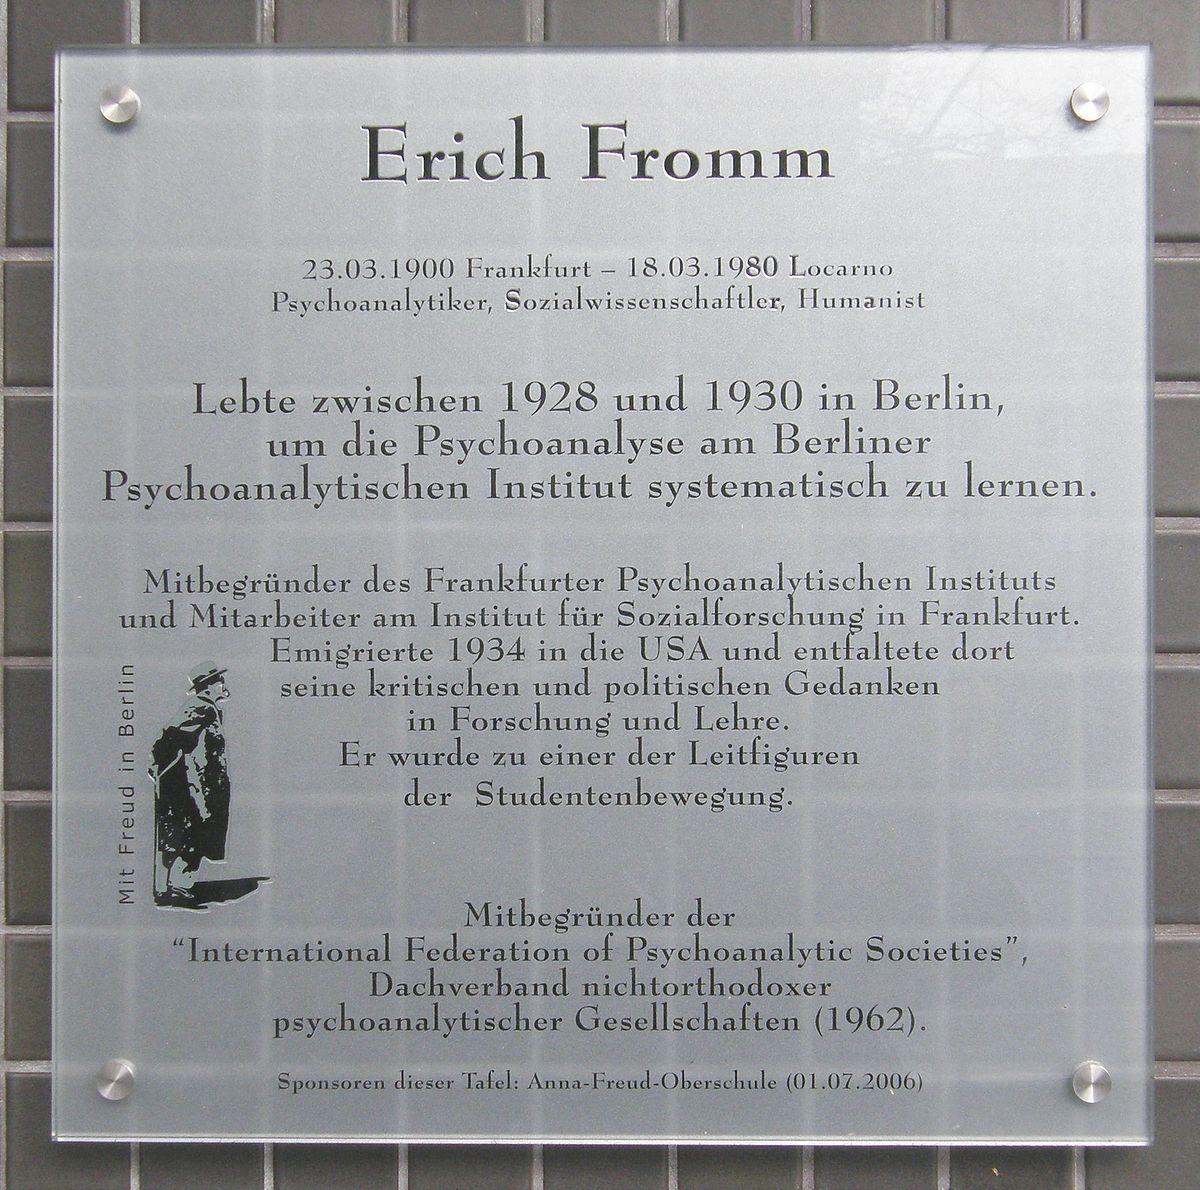 Erich Fromm - Wîkîpediya